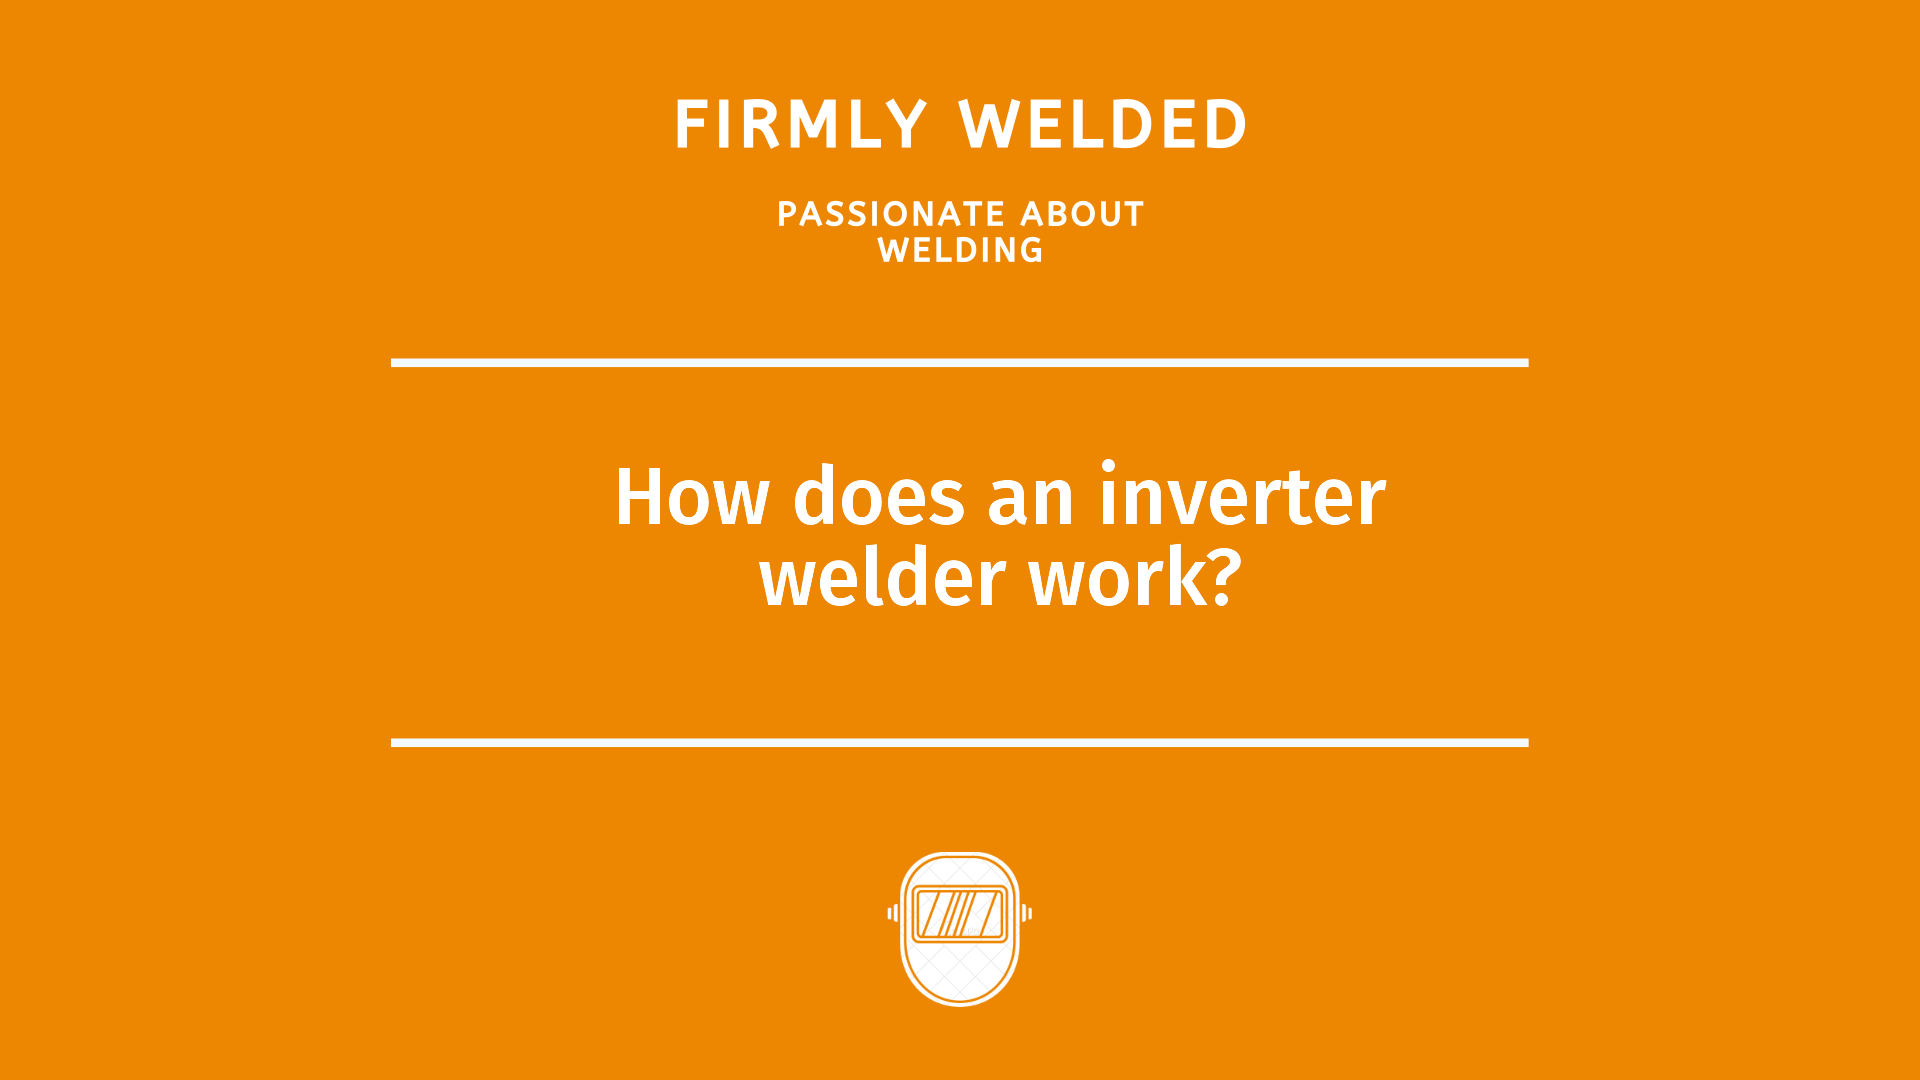 How does an inverter welder work?